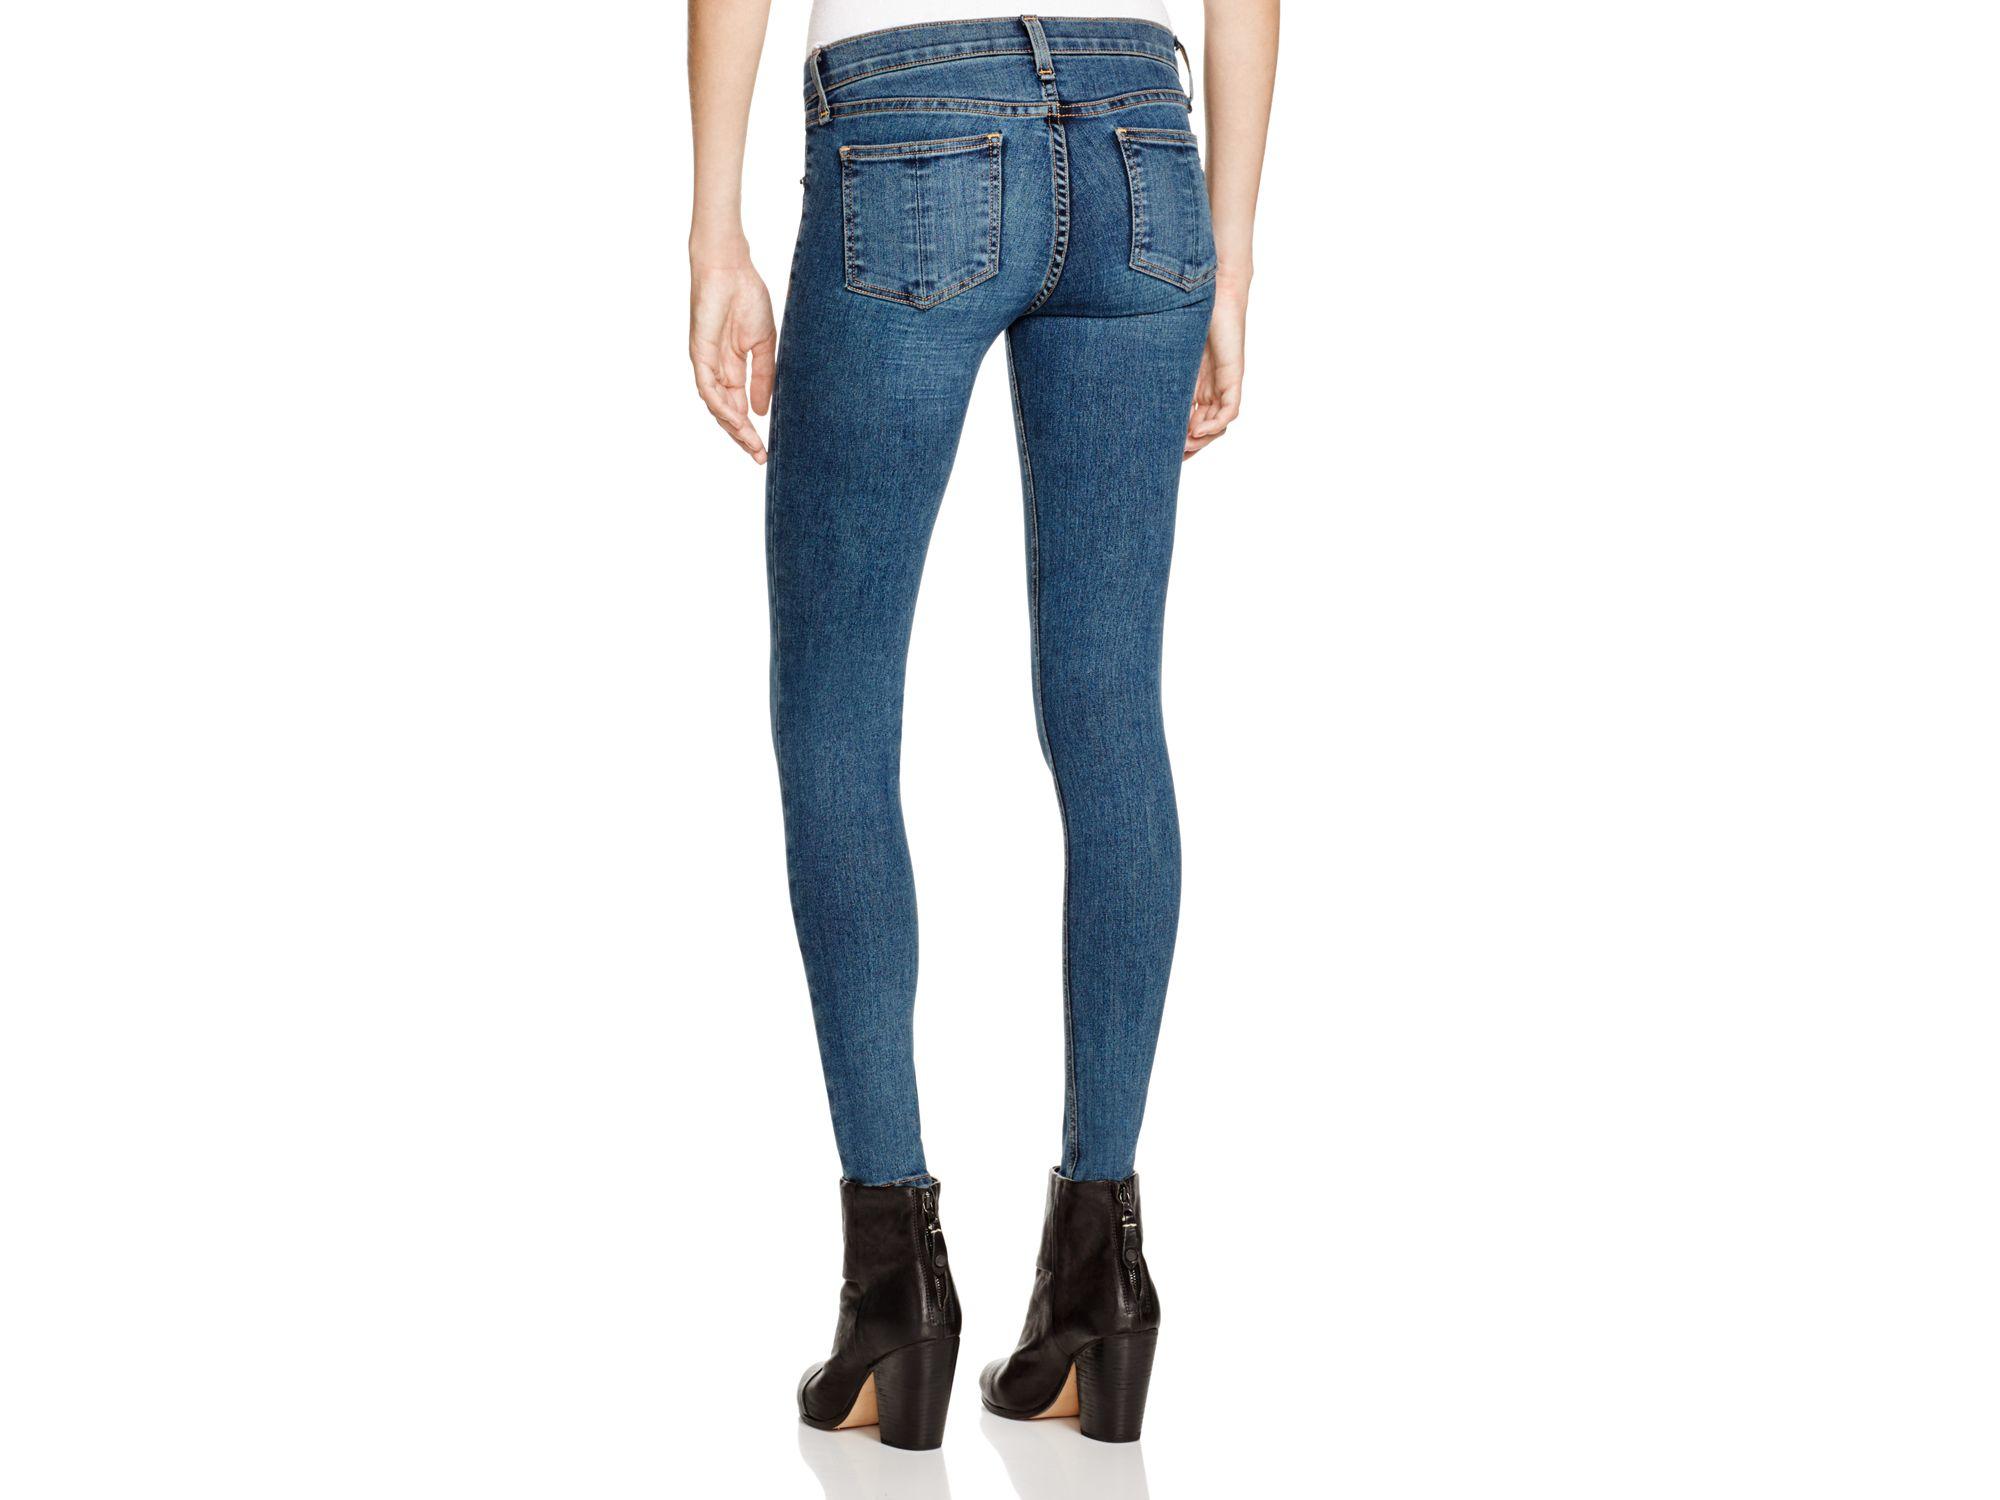 skinny denim jeans - Blue Rag & Bone Sale Low Cost 8bNbxHepiz